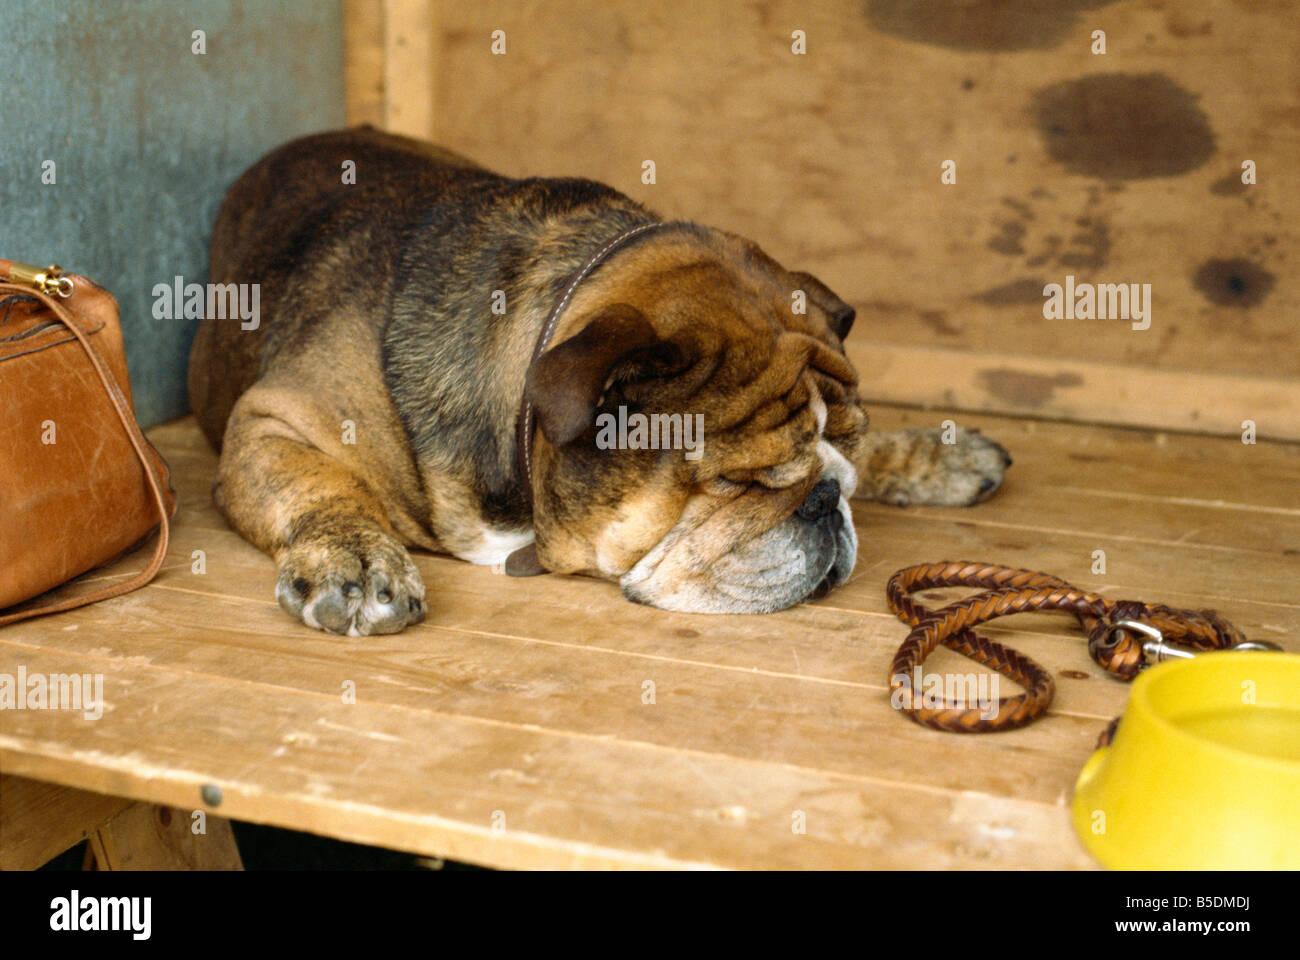 Dog waits patiently at dog show, England, Europe - Stock Image